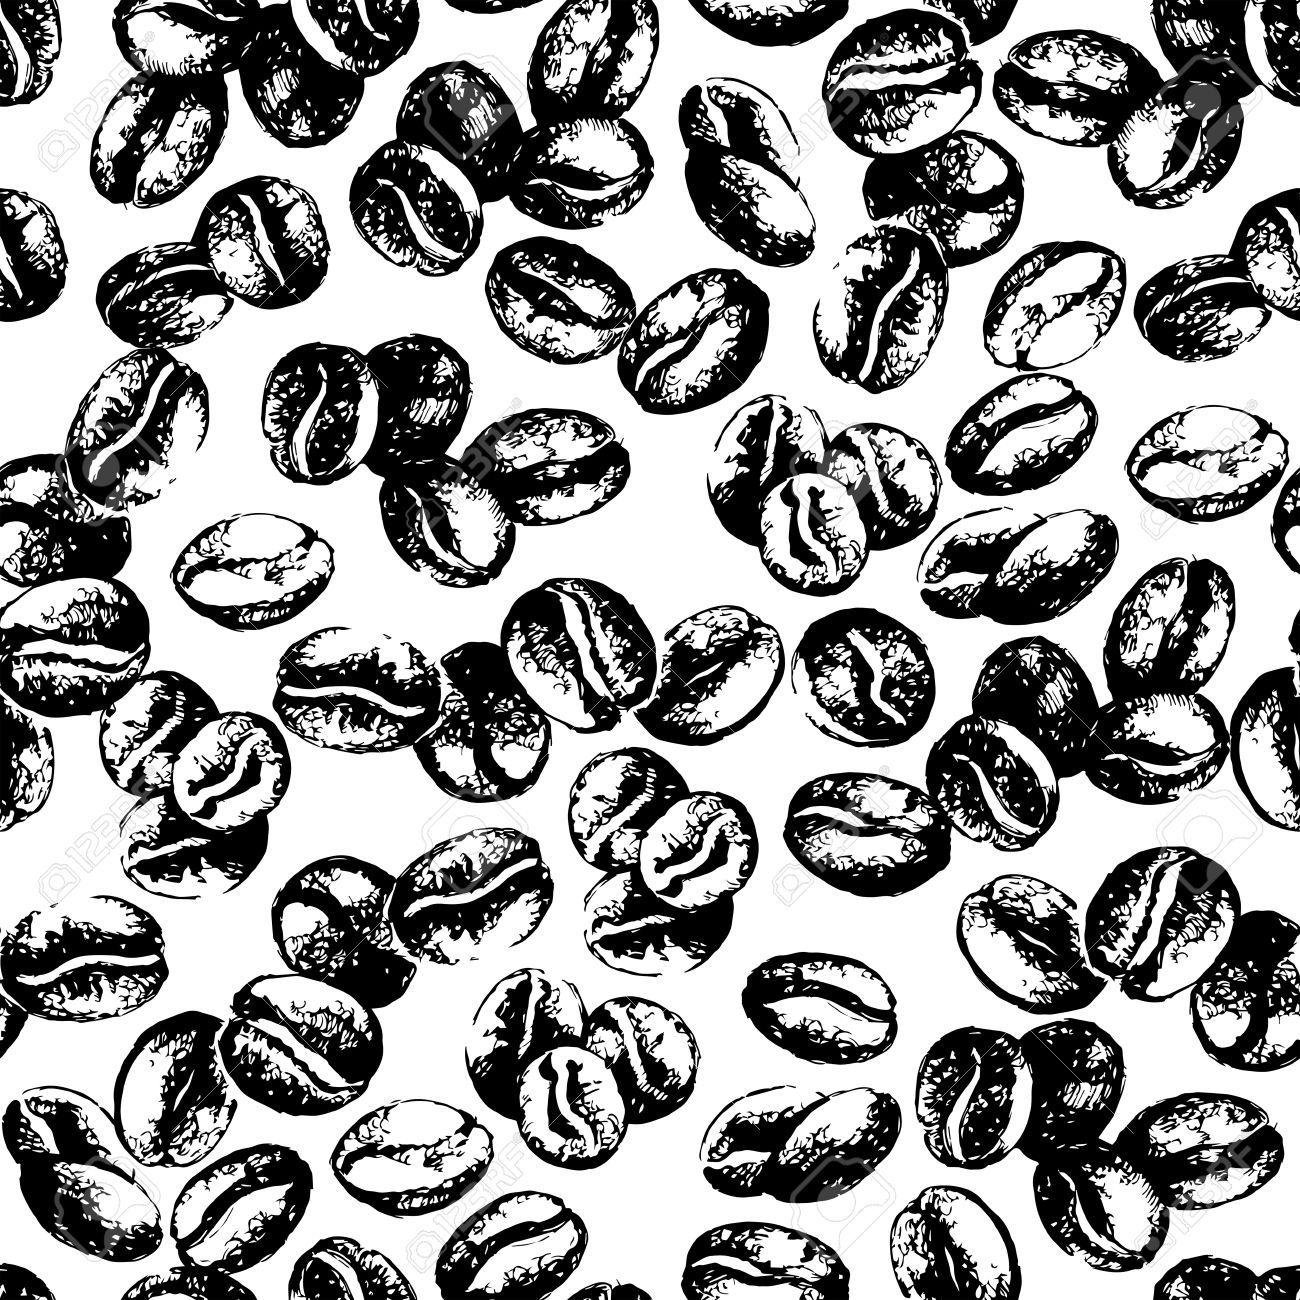 Coffee beans pattern ilustraciones manualidades cafeteria